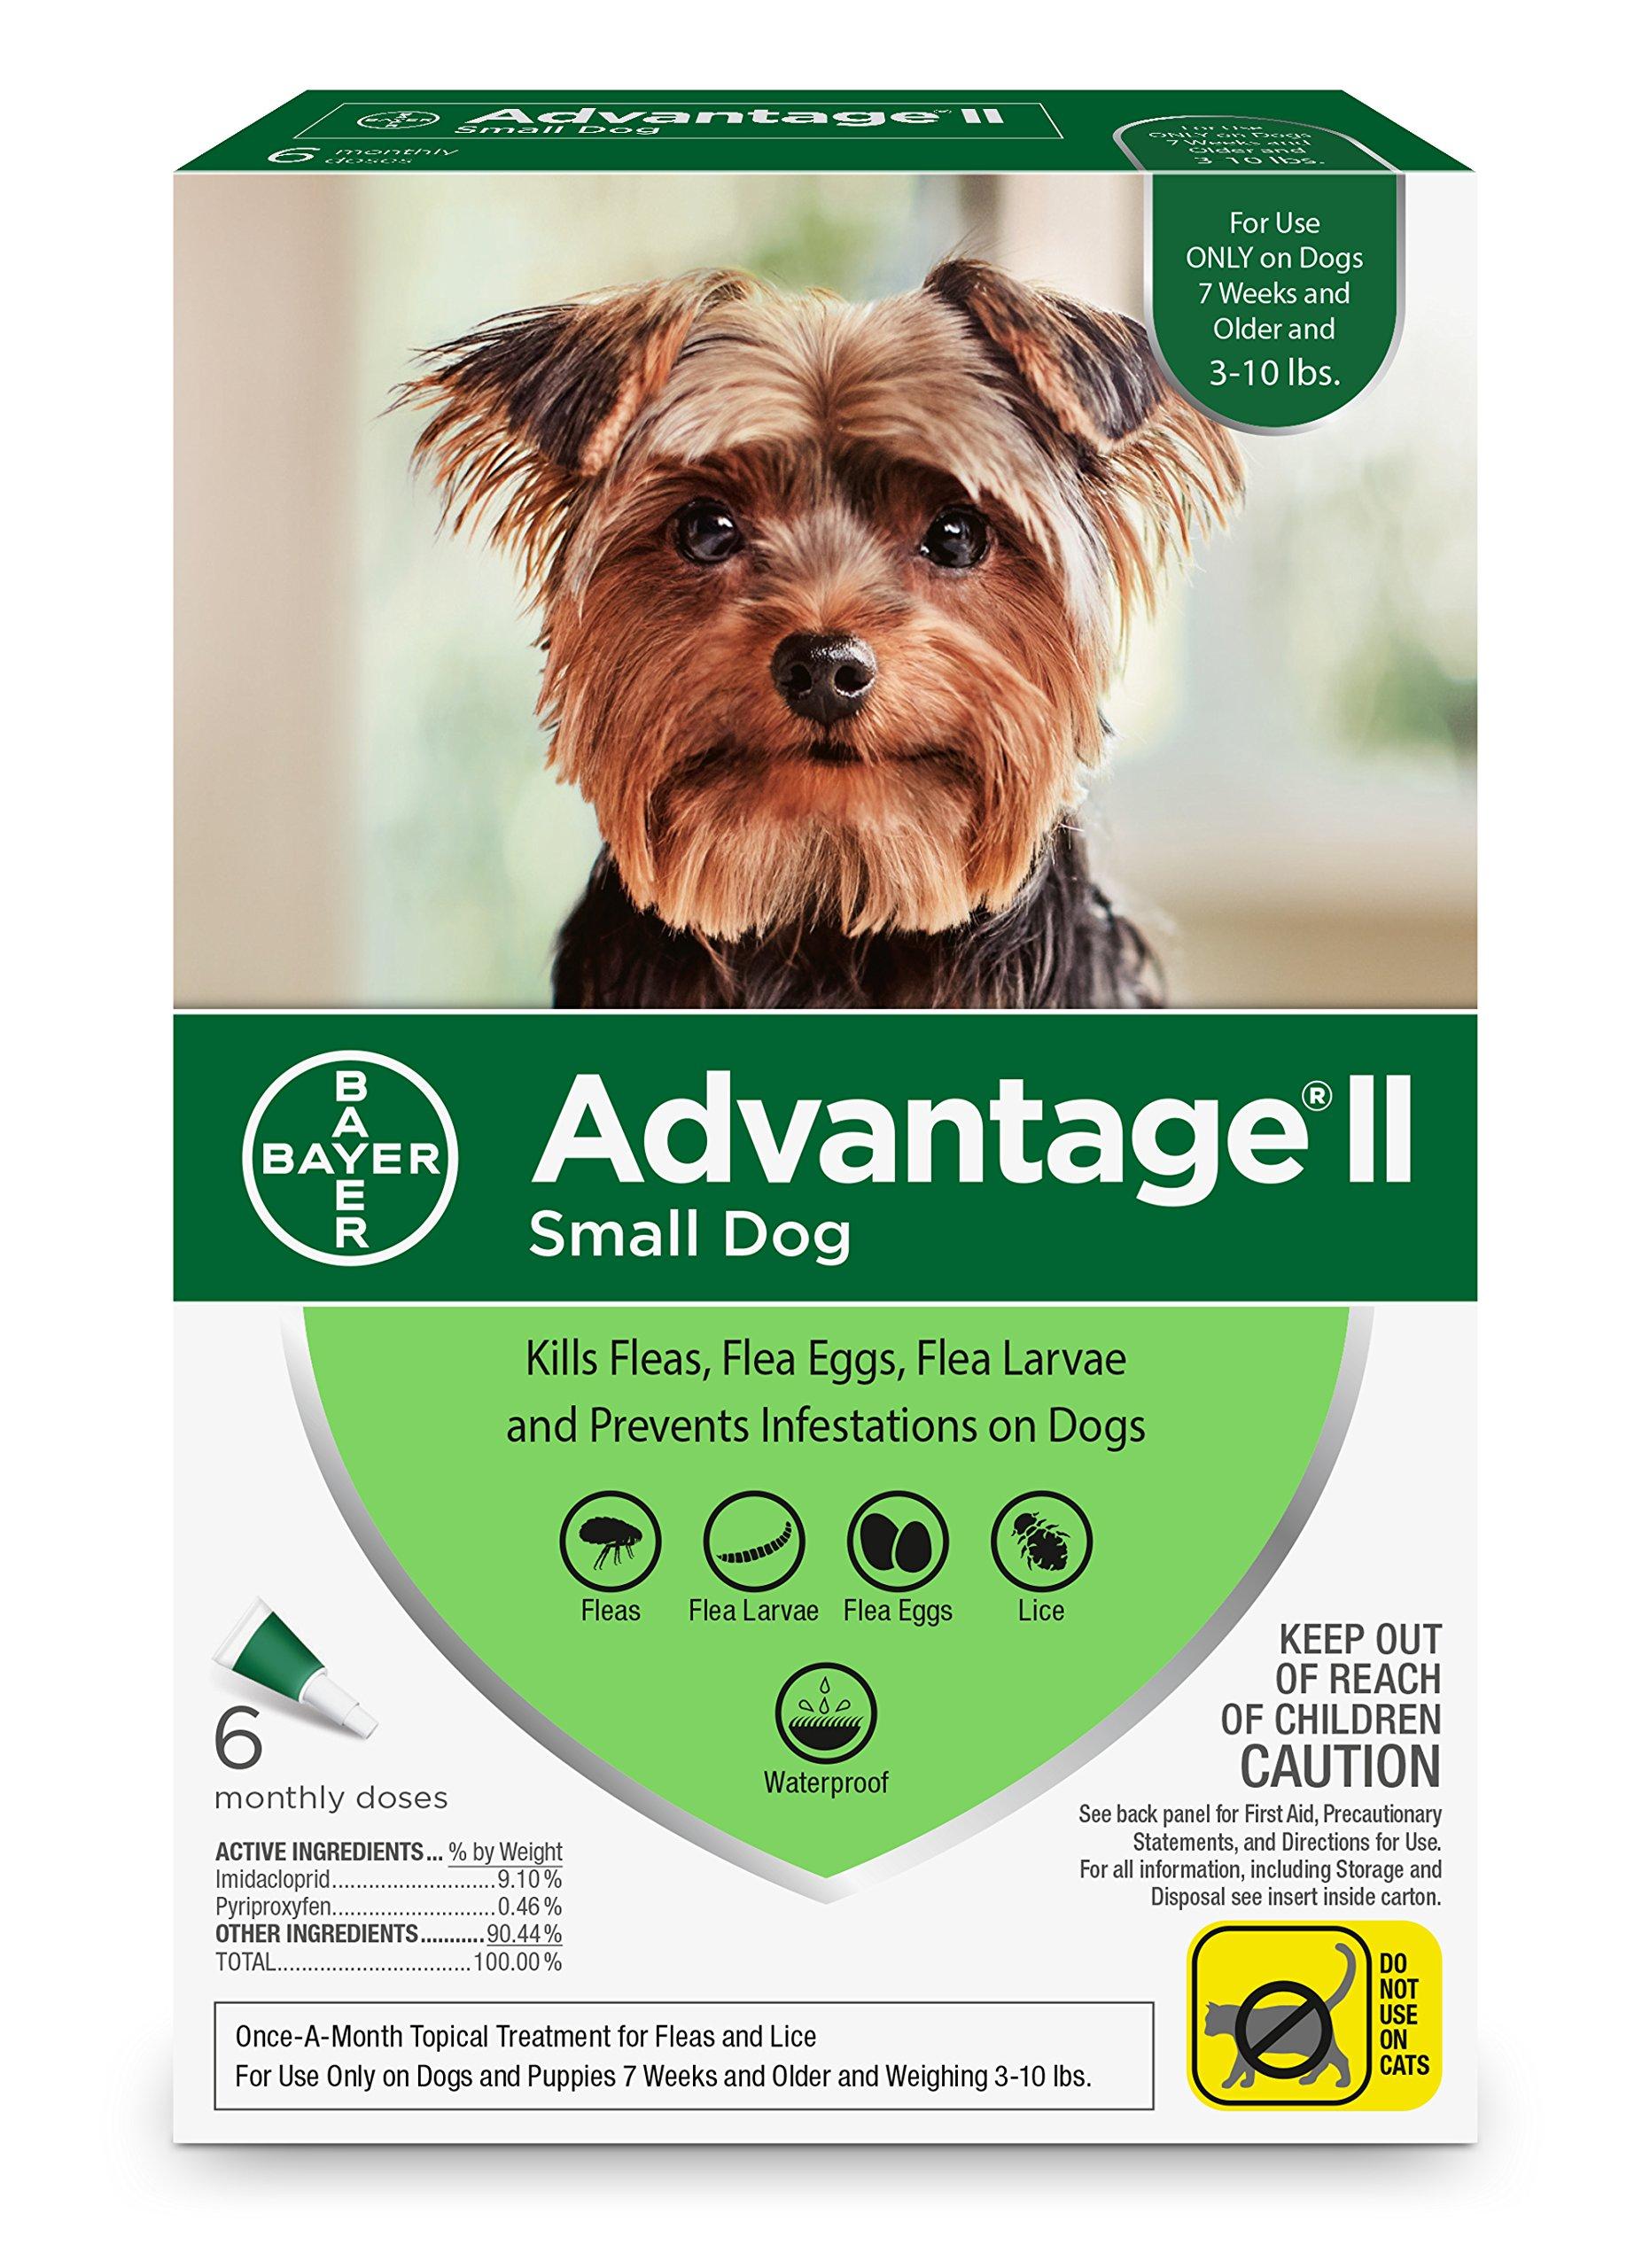 Bayer Advantage II Flea and Lice Treatment for Small Dogs, 3-10 lb, 6 doses